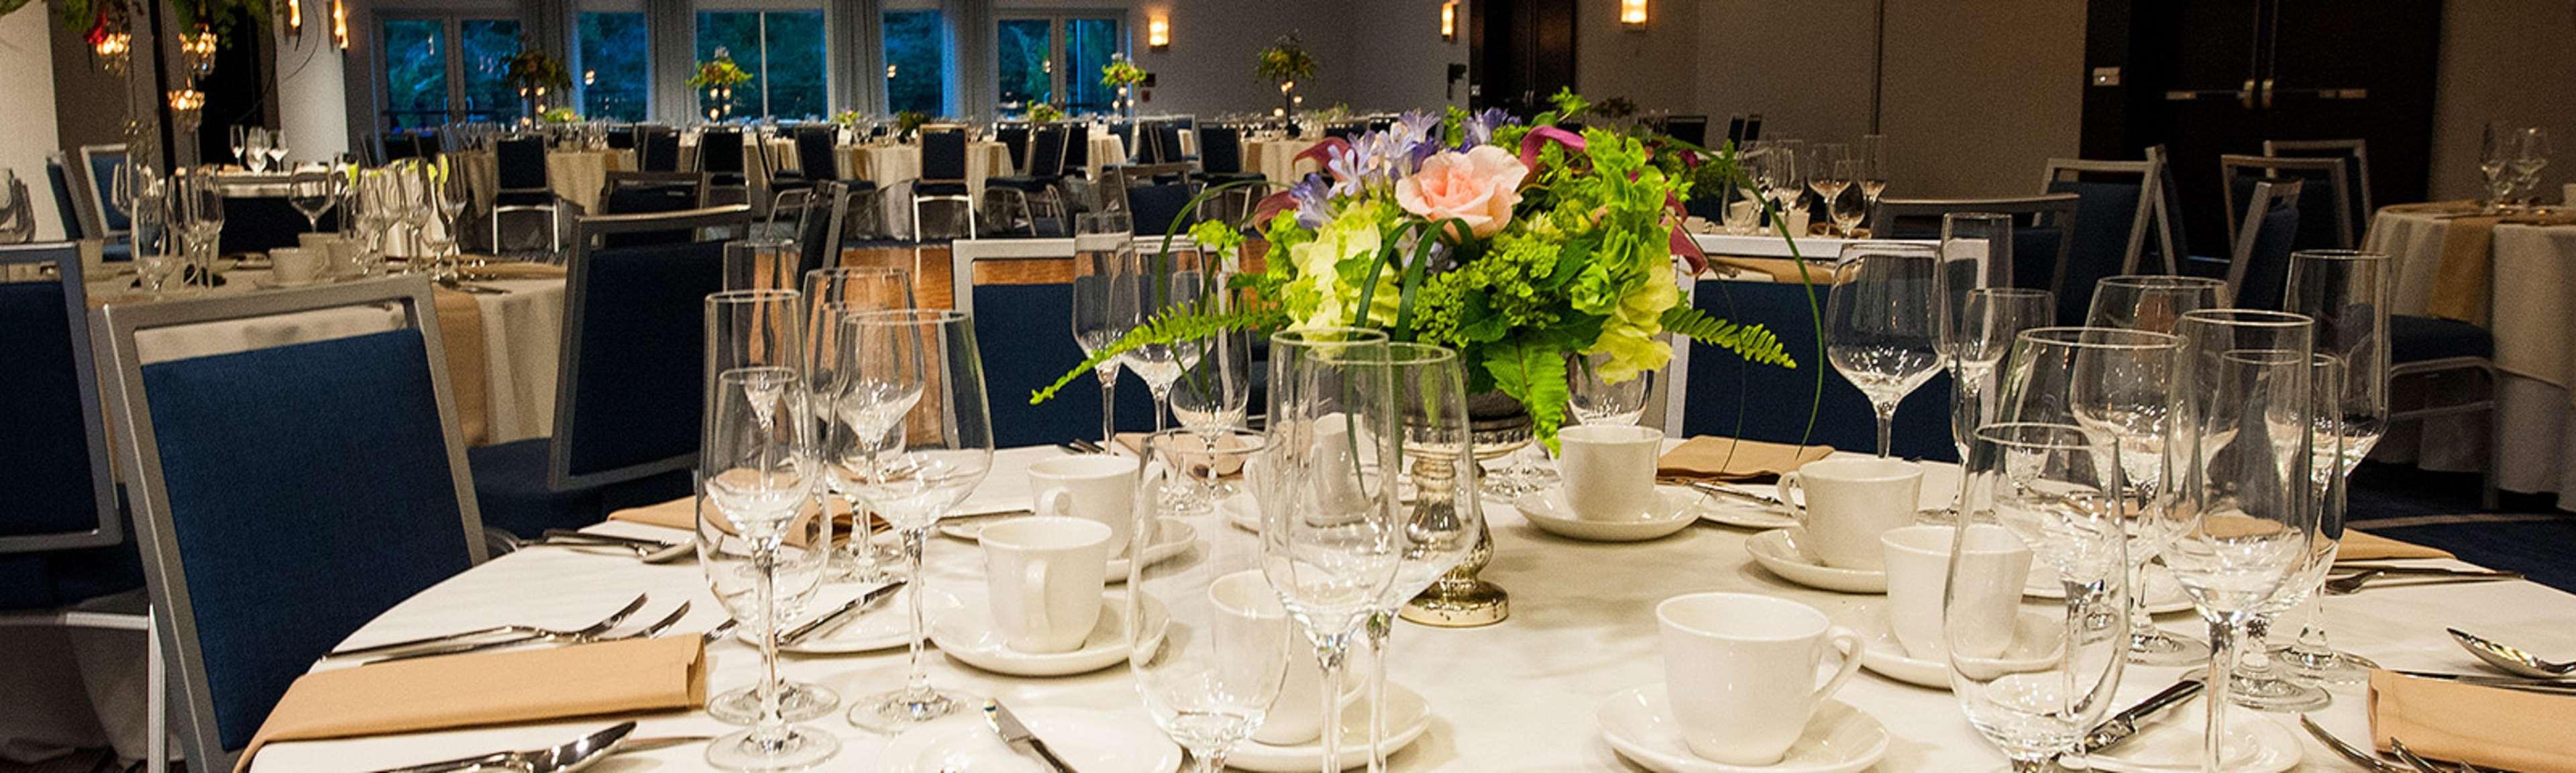 Restaurants Near Doubletree Hilton Bristol